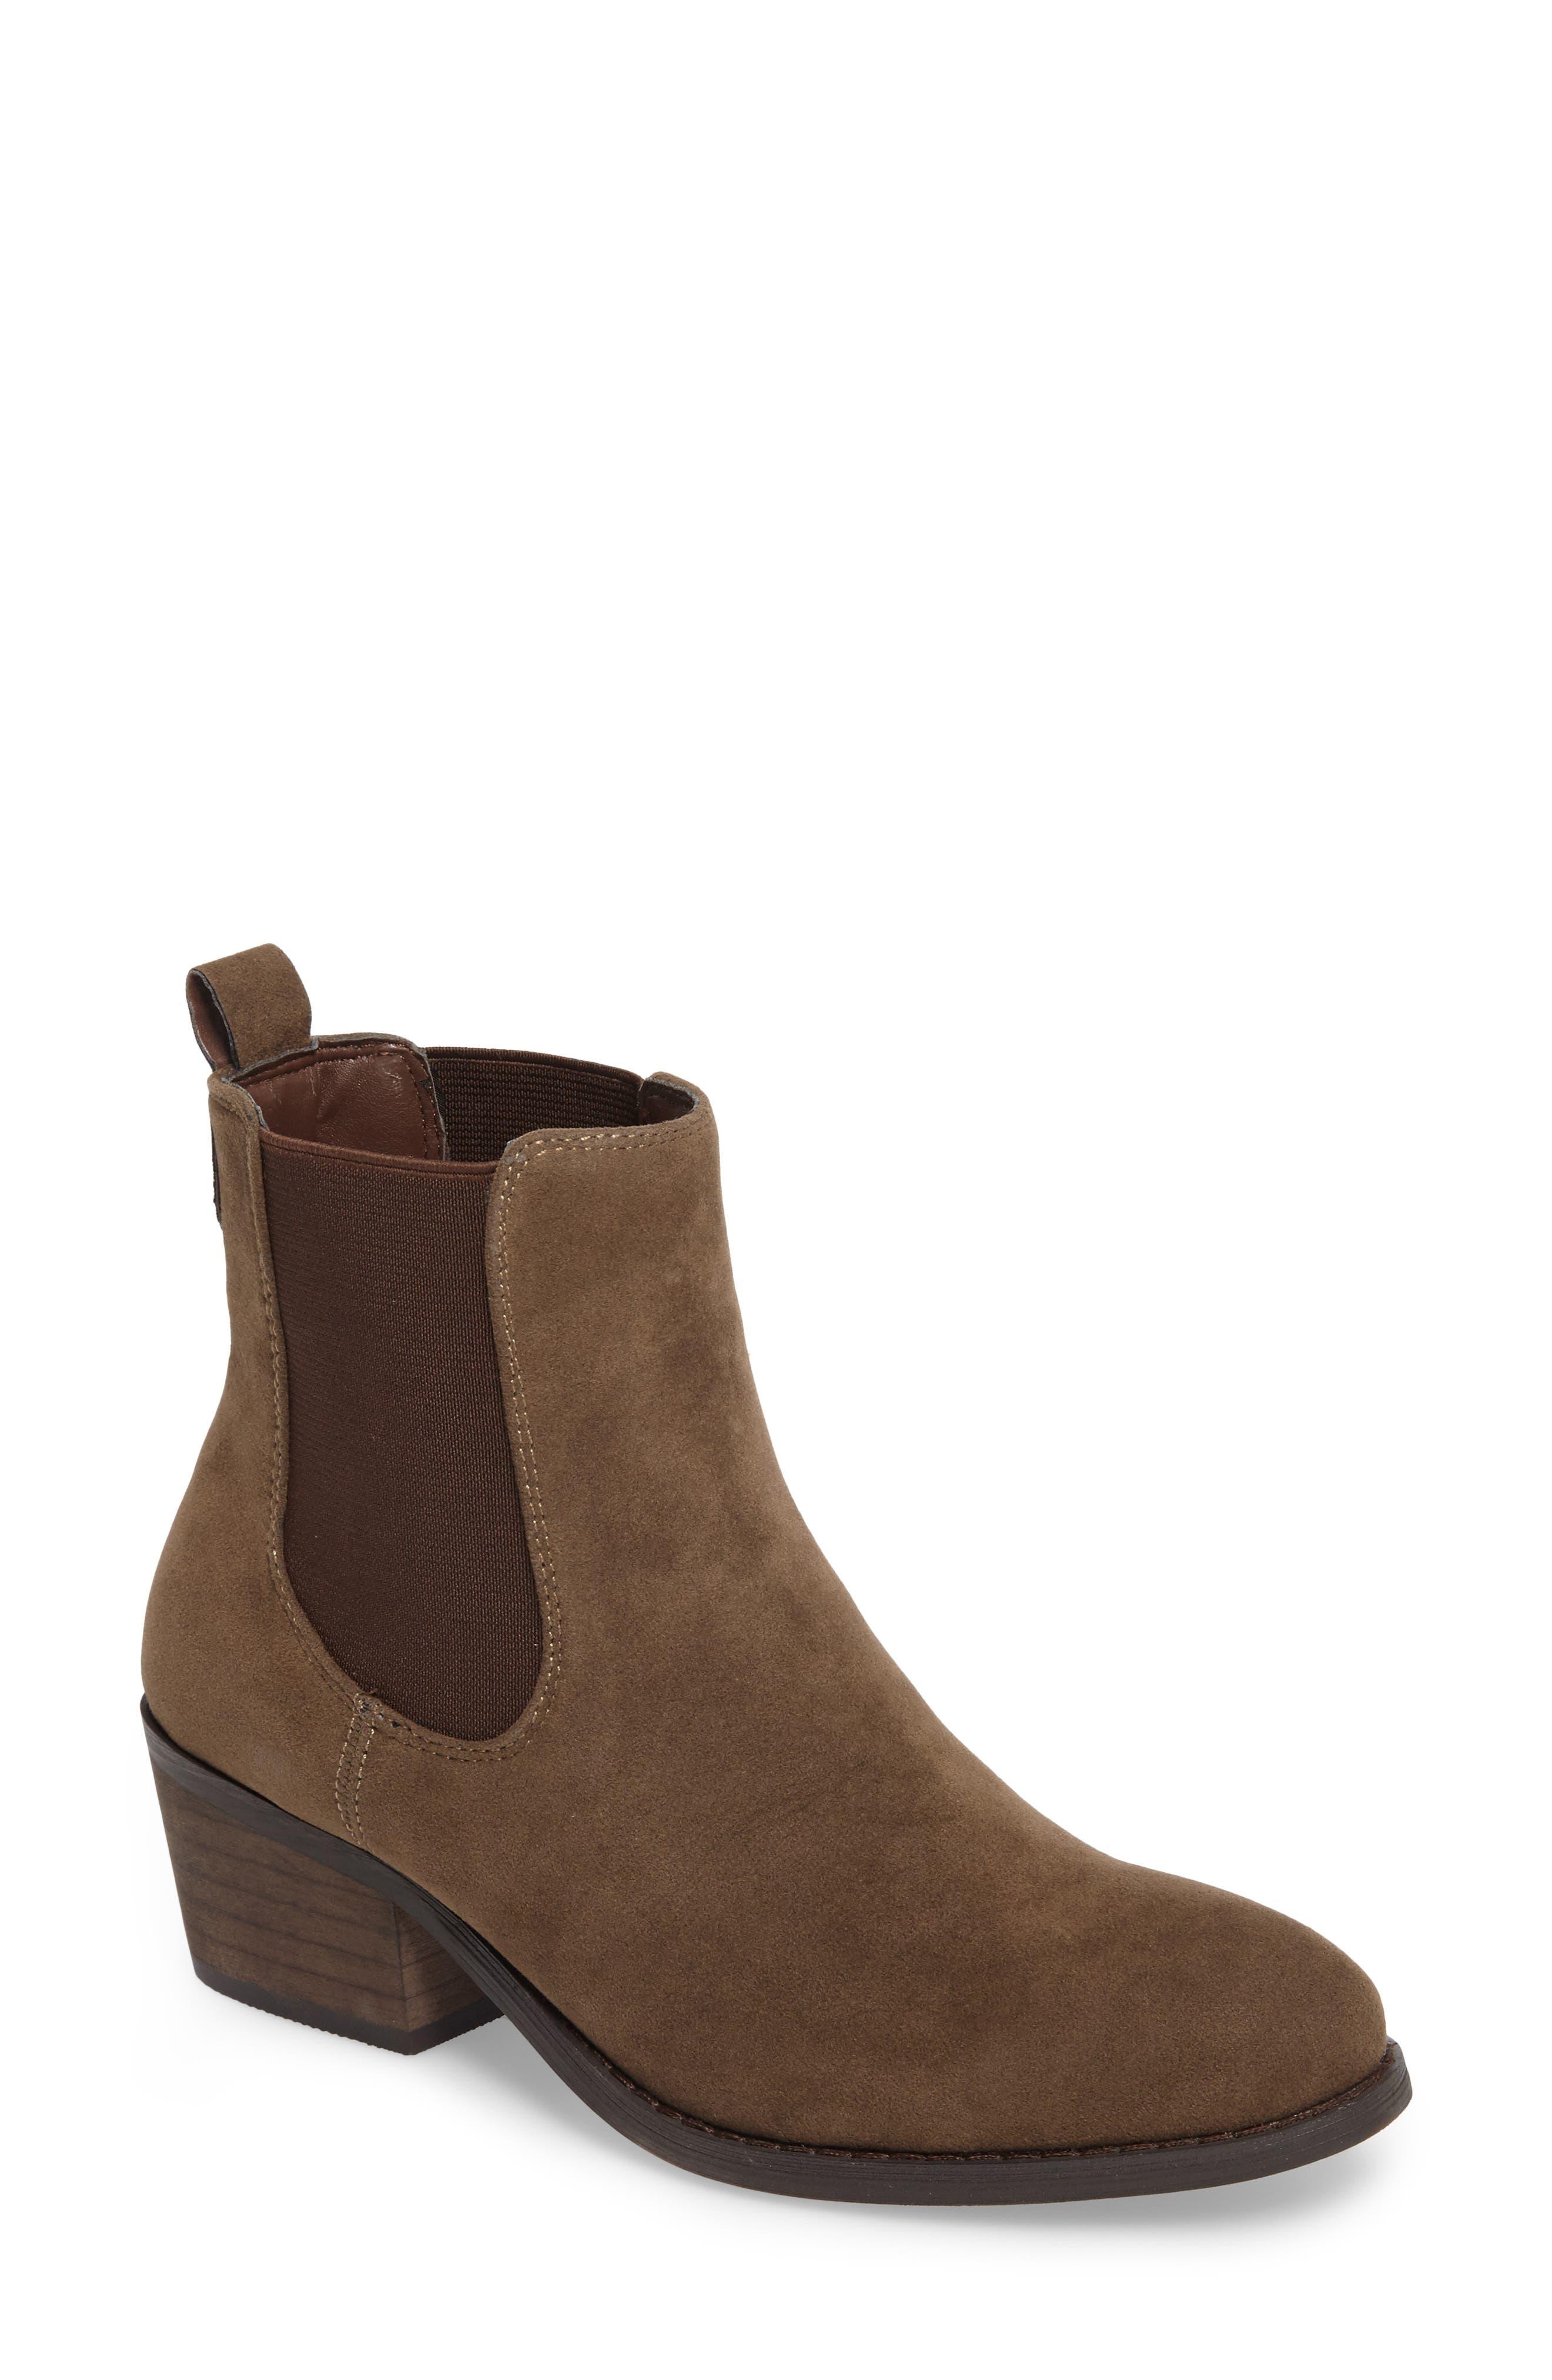 Alternate Image 1 Selected - Callisto Ammore Chelsea Boot (Women)